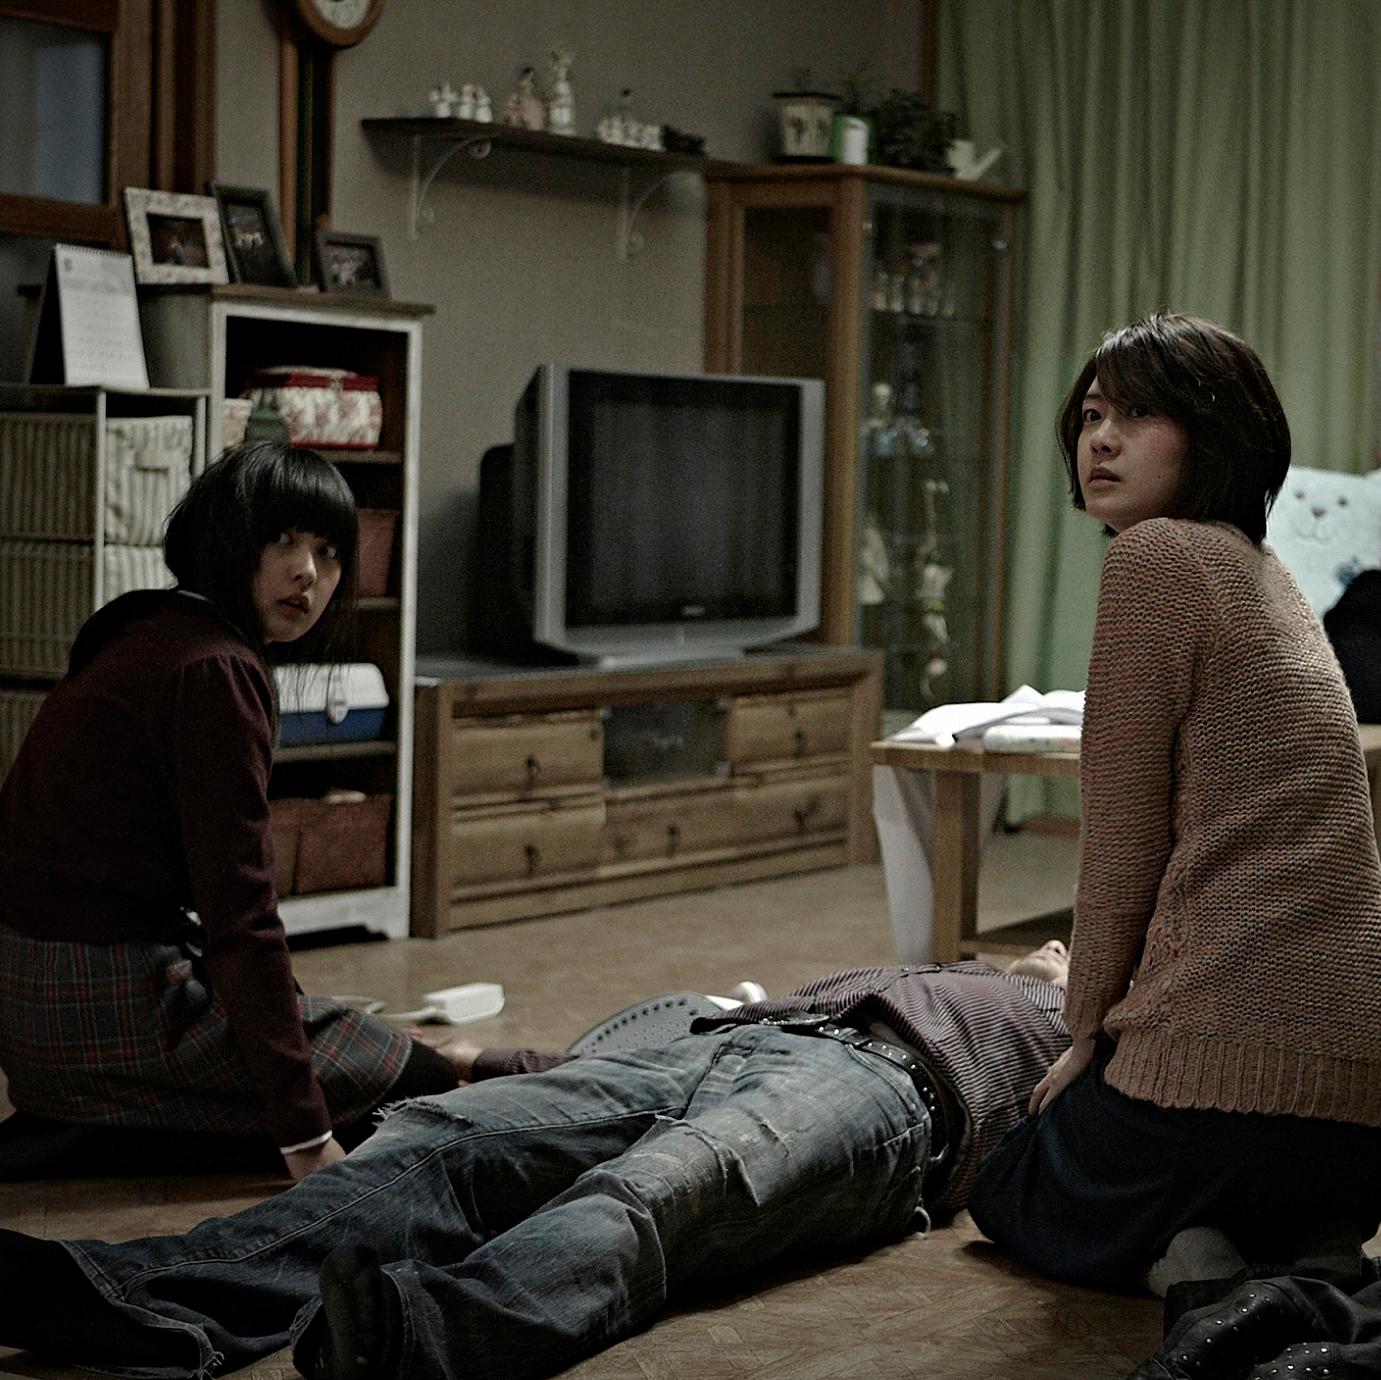 <p>東野圭吾近期作品盤點!《假面飯店》、《嫌疑犯X》...3月份3部電影來襲!</p>